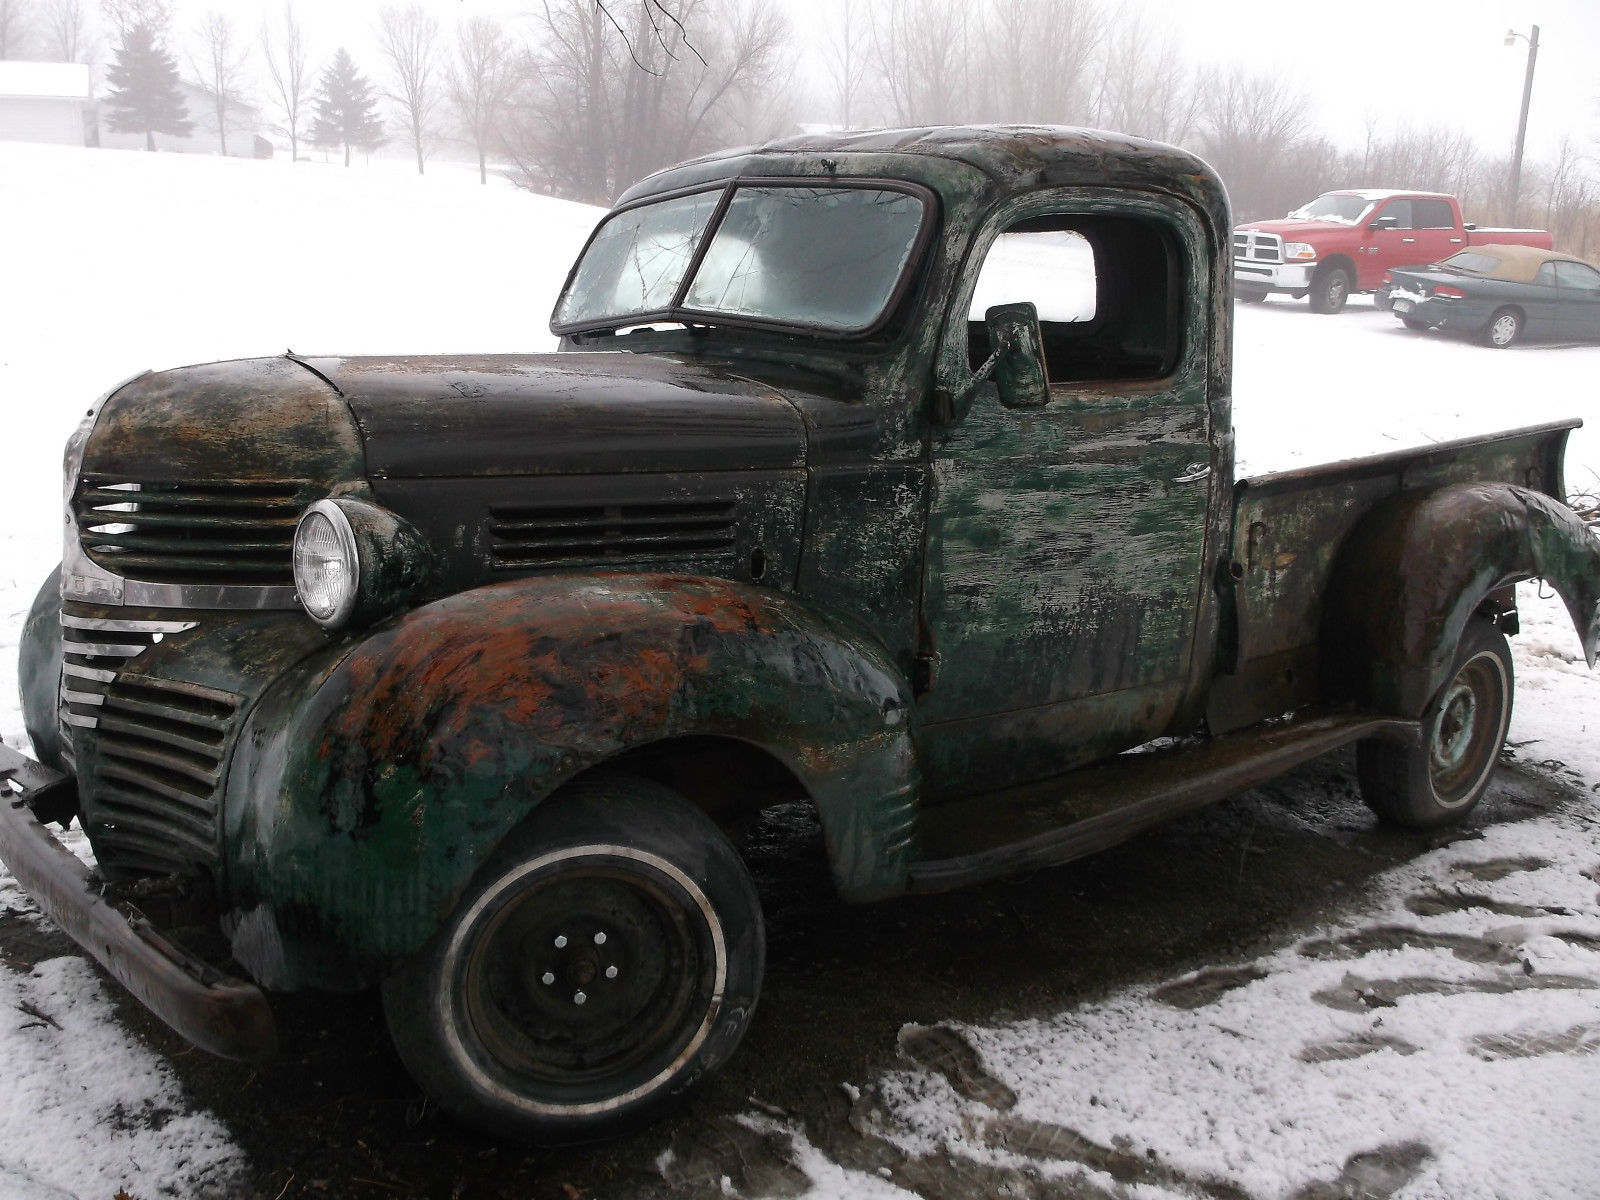 1940 Dodge Pickup Truck 1 2 Ton Short Box Patina Rat Rod Classic Dodge Other Pickups 1940 For Sale